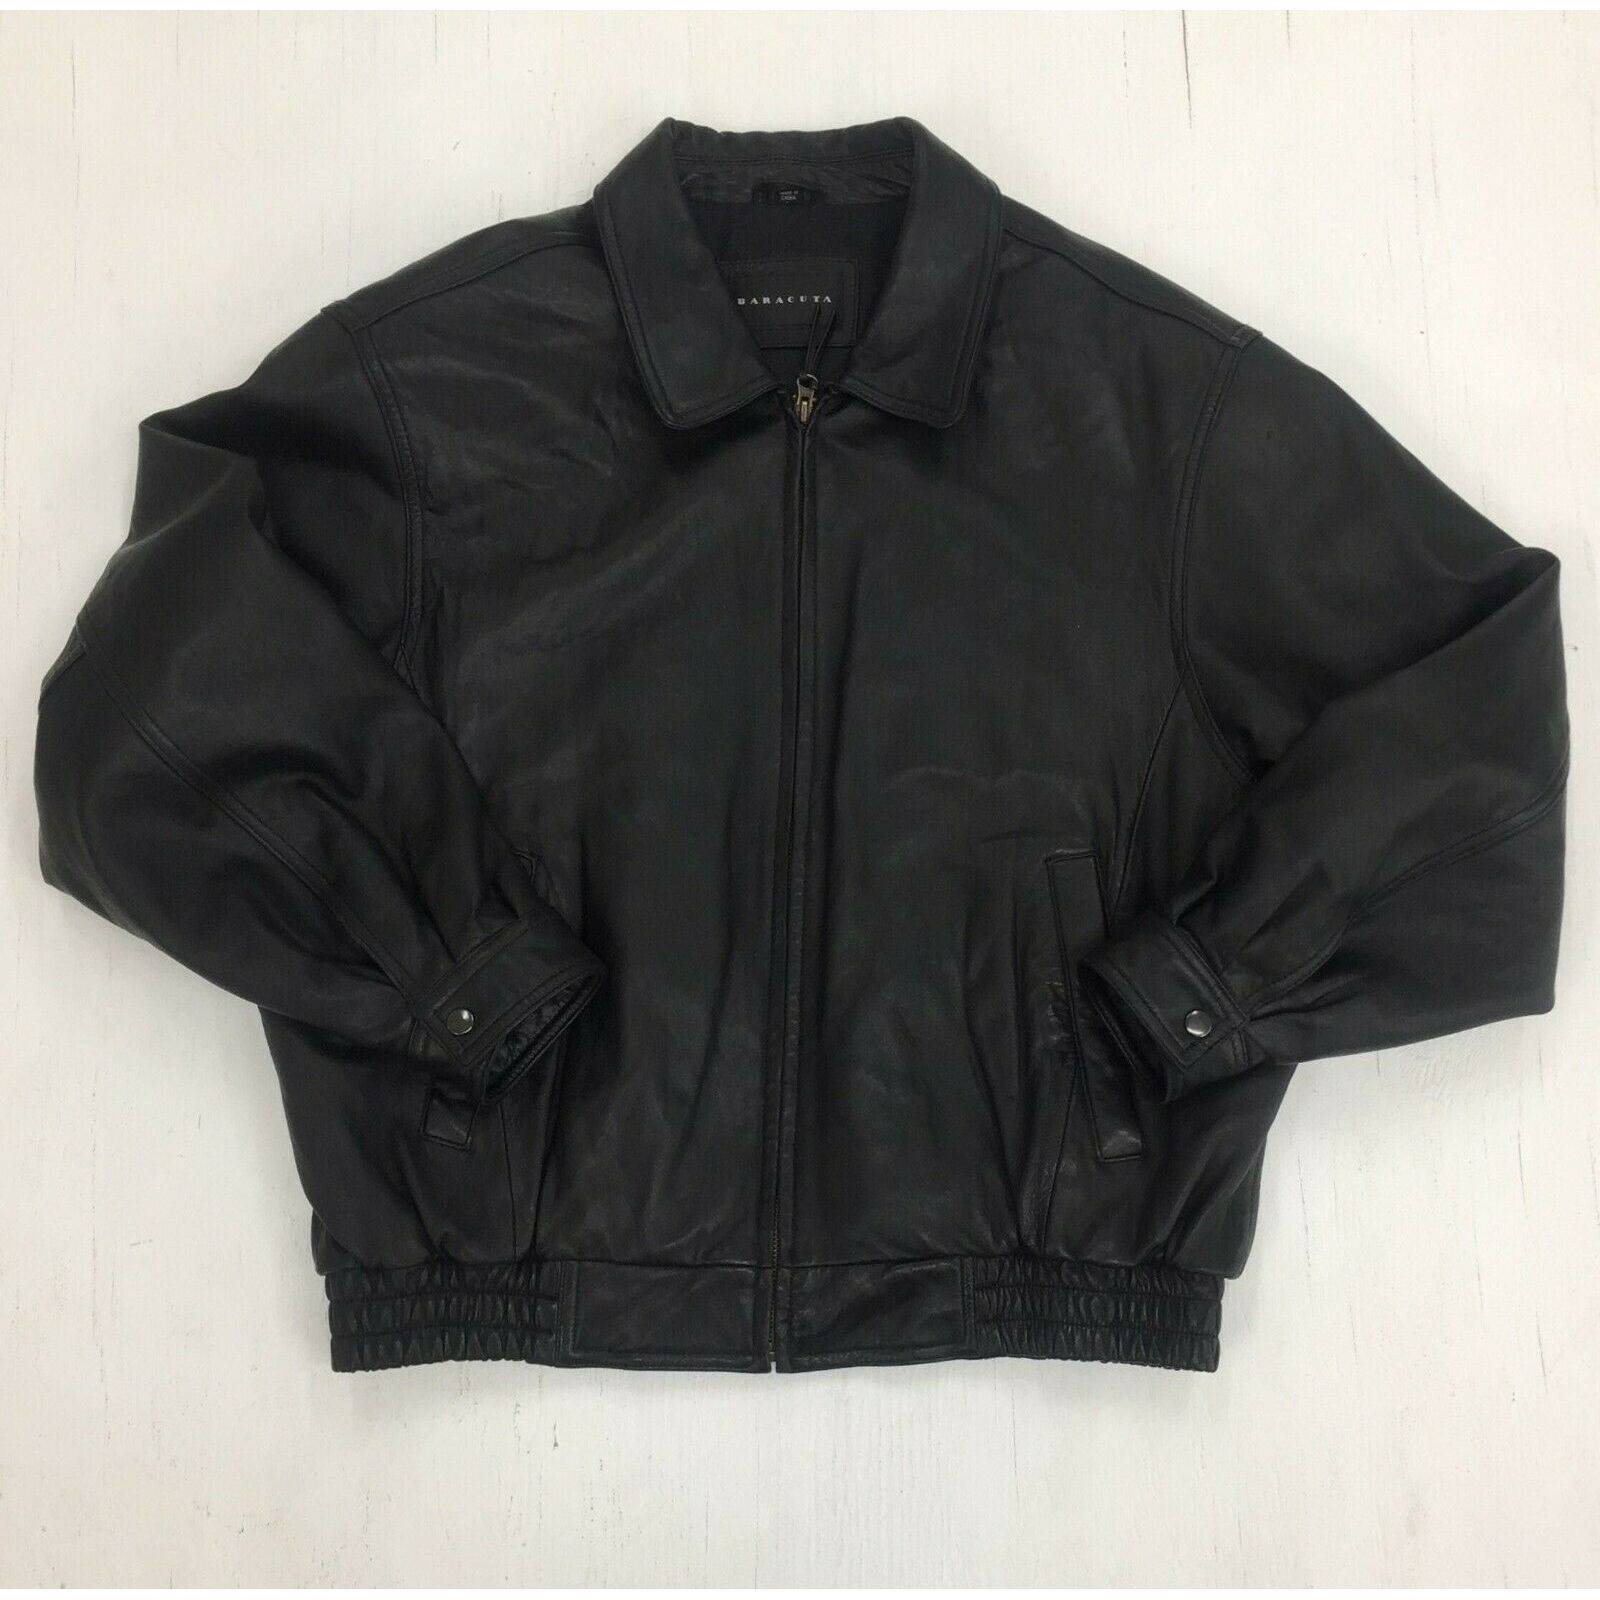 Baracuta Leather Motorcycle Jacket L